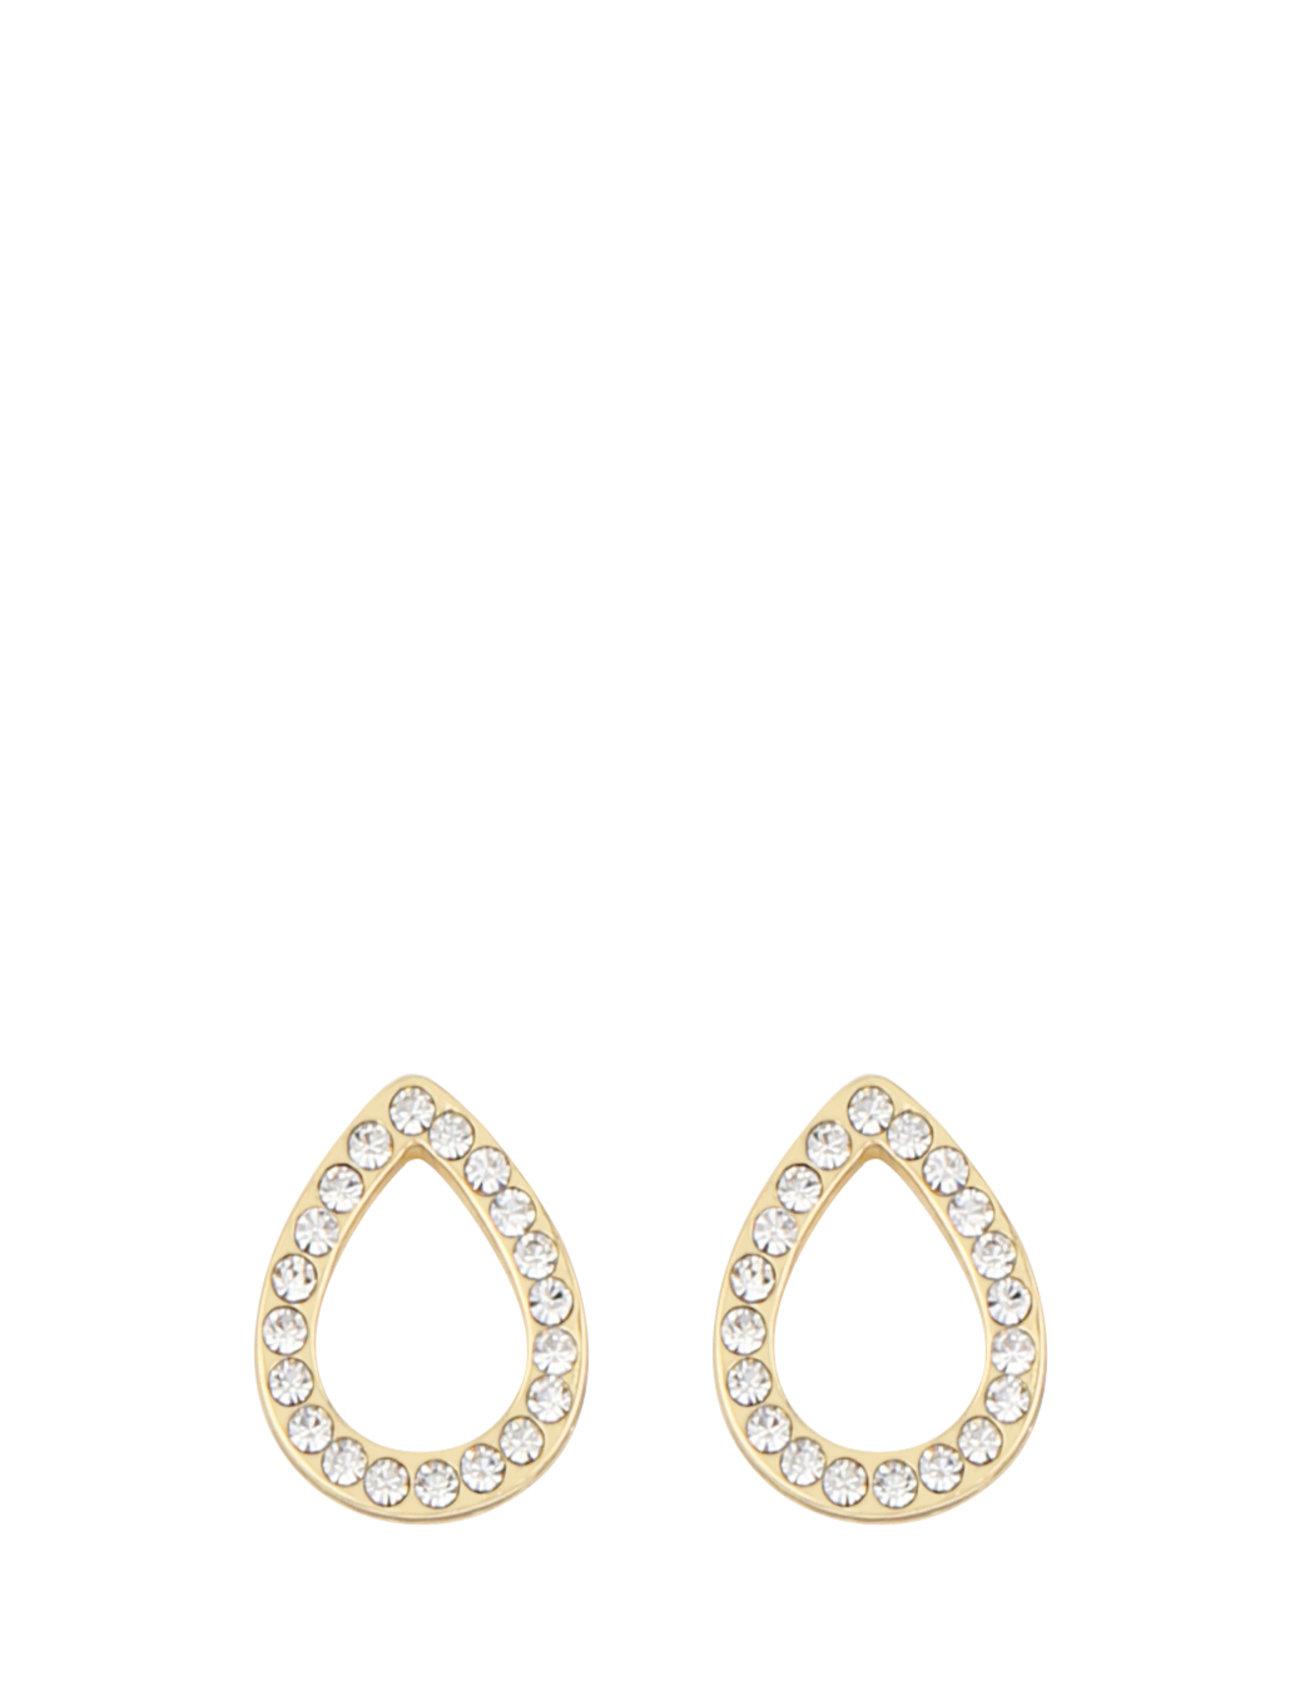 Image of Ciel Small Ear Accessories Jewellery Earrings Studs Guld SNÖ Of Sweden (3266926575)